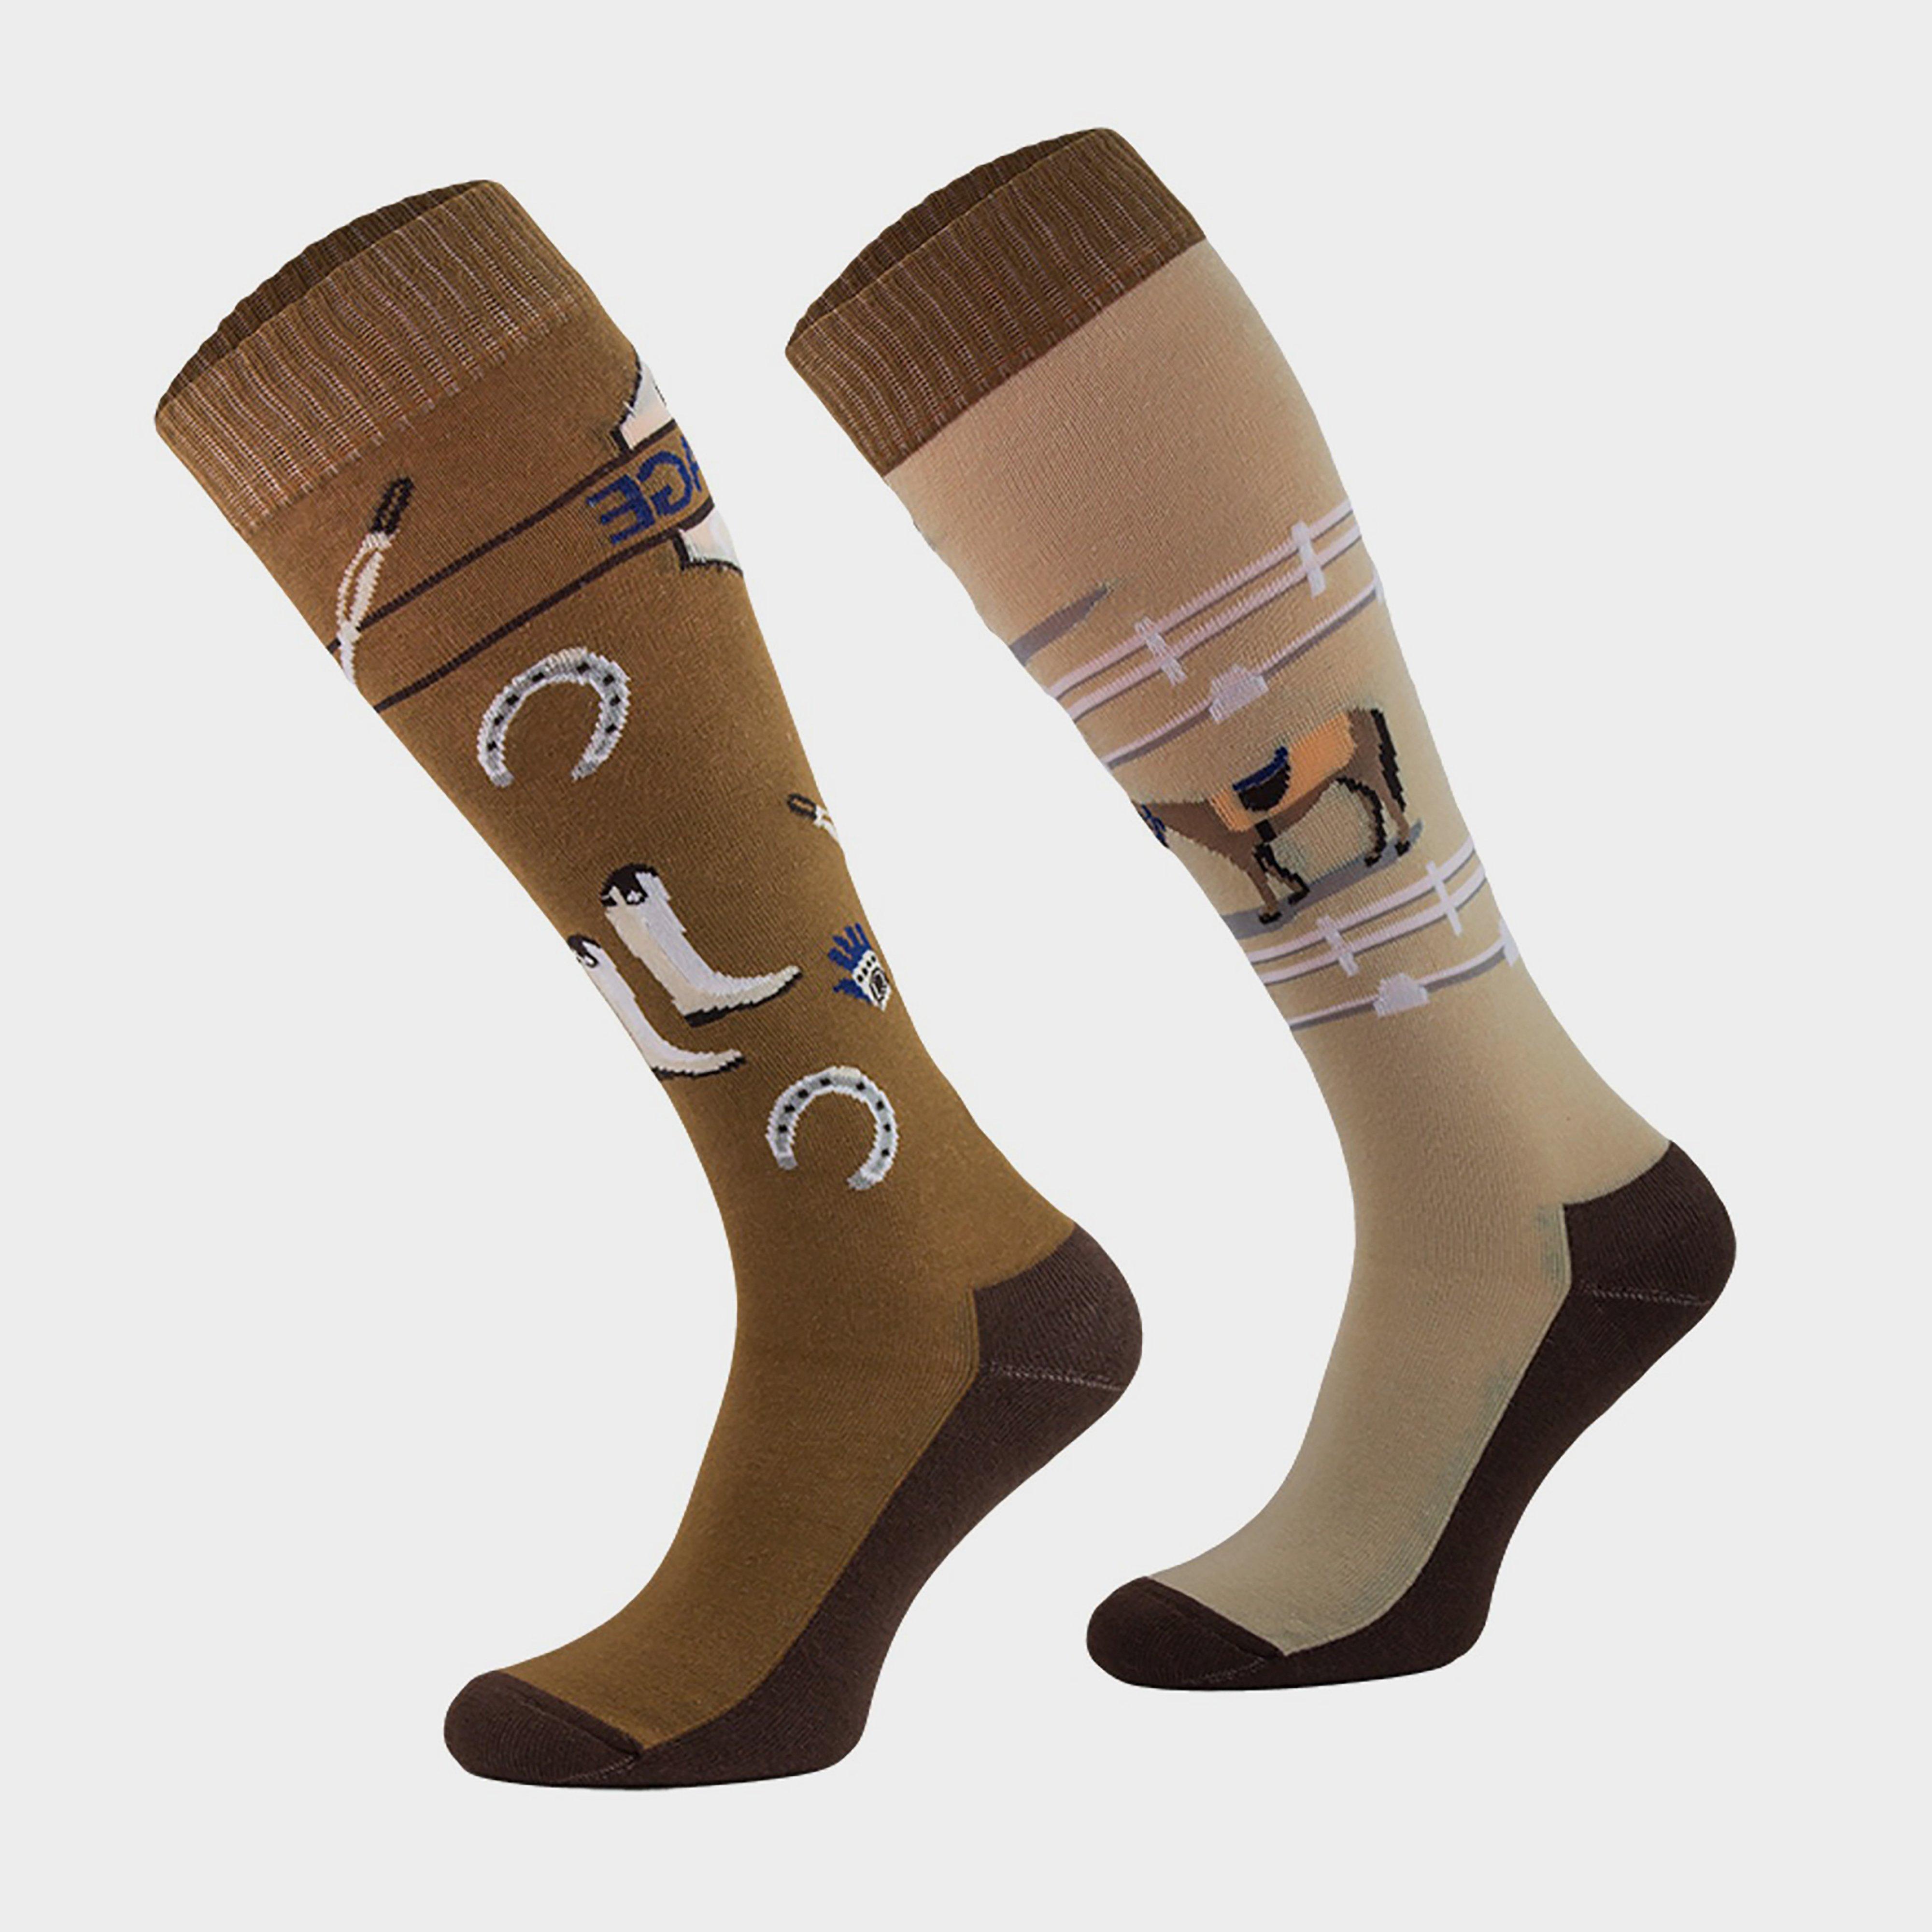 Image of Comodo Adults Novelty Fun Socks Dressage - Brown/Brown, Brown/BROWN